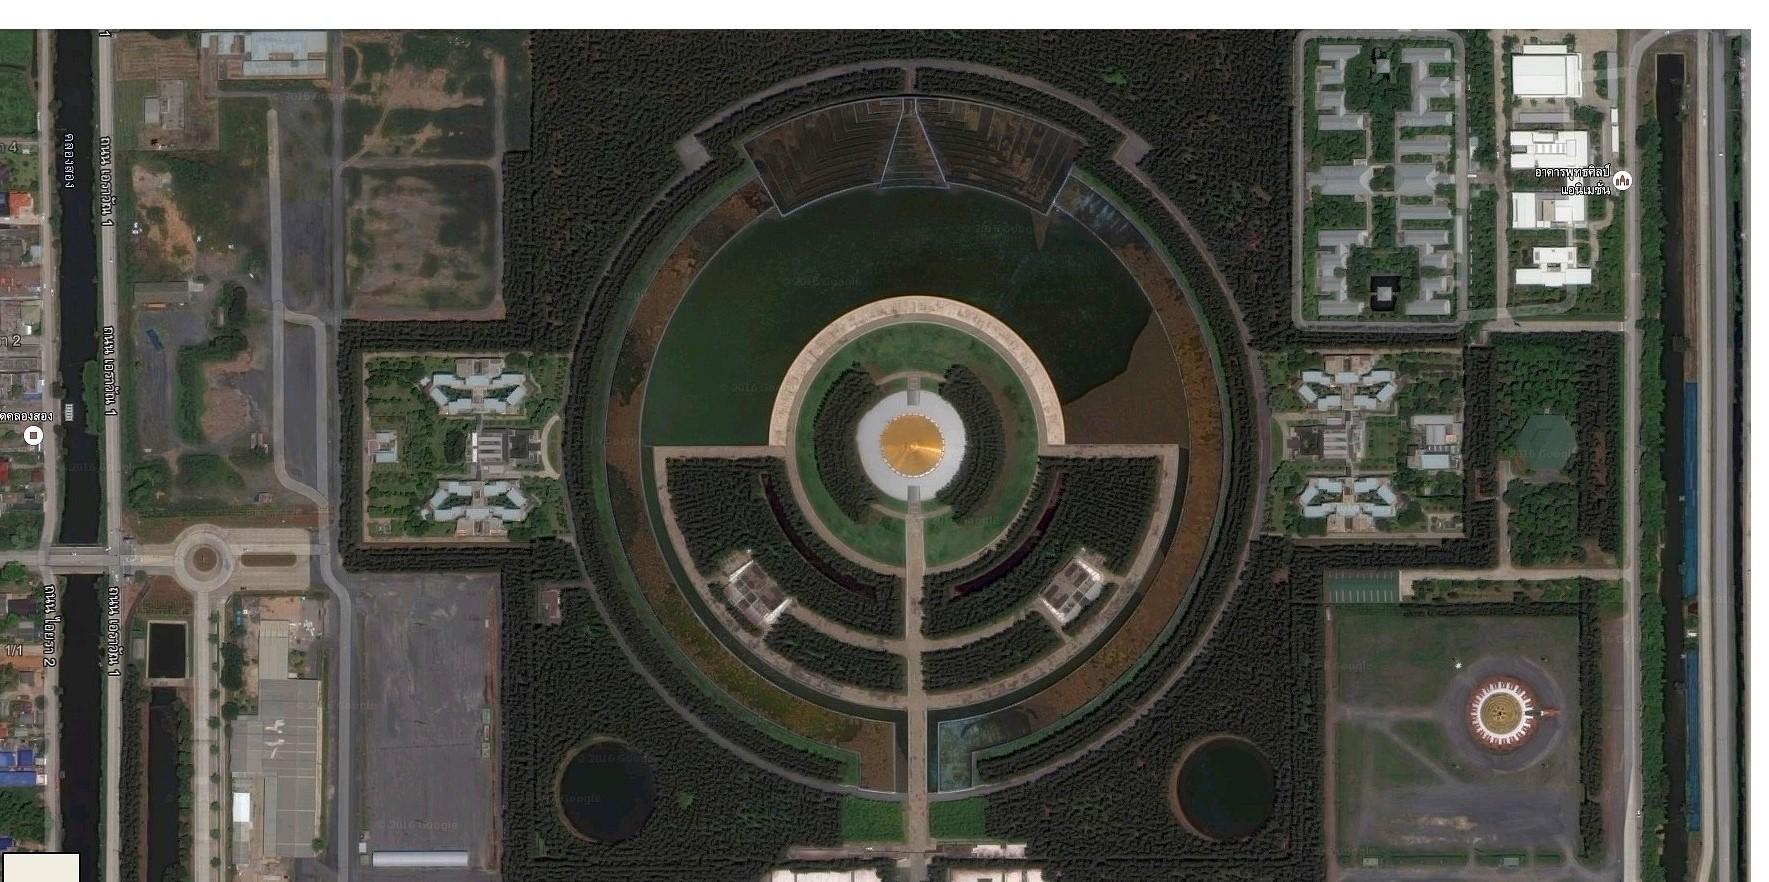 Satelitní fotografie oblasti 60 - Wat Phra Dhammakaya